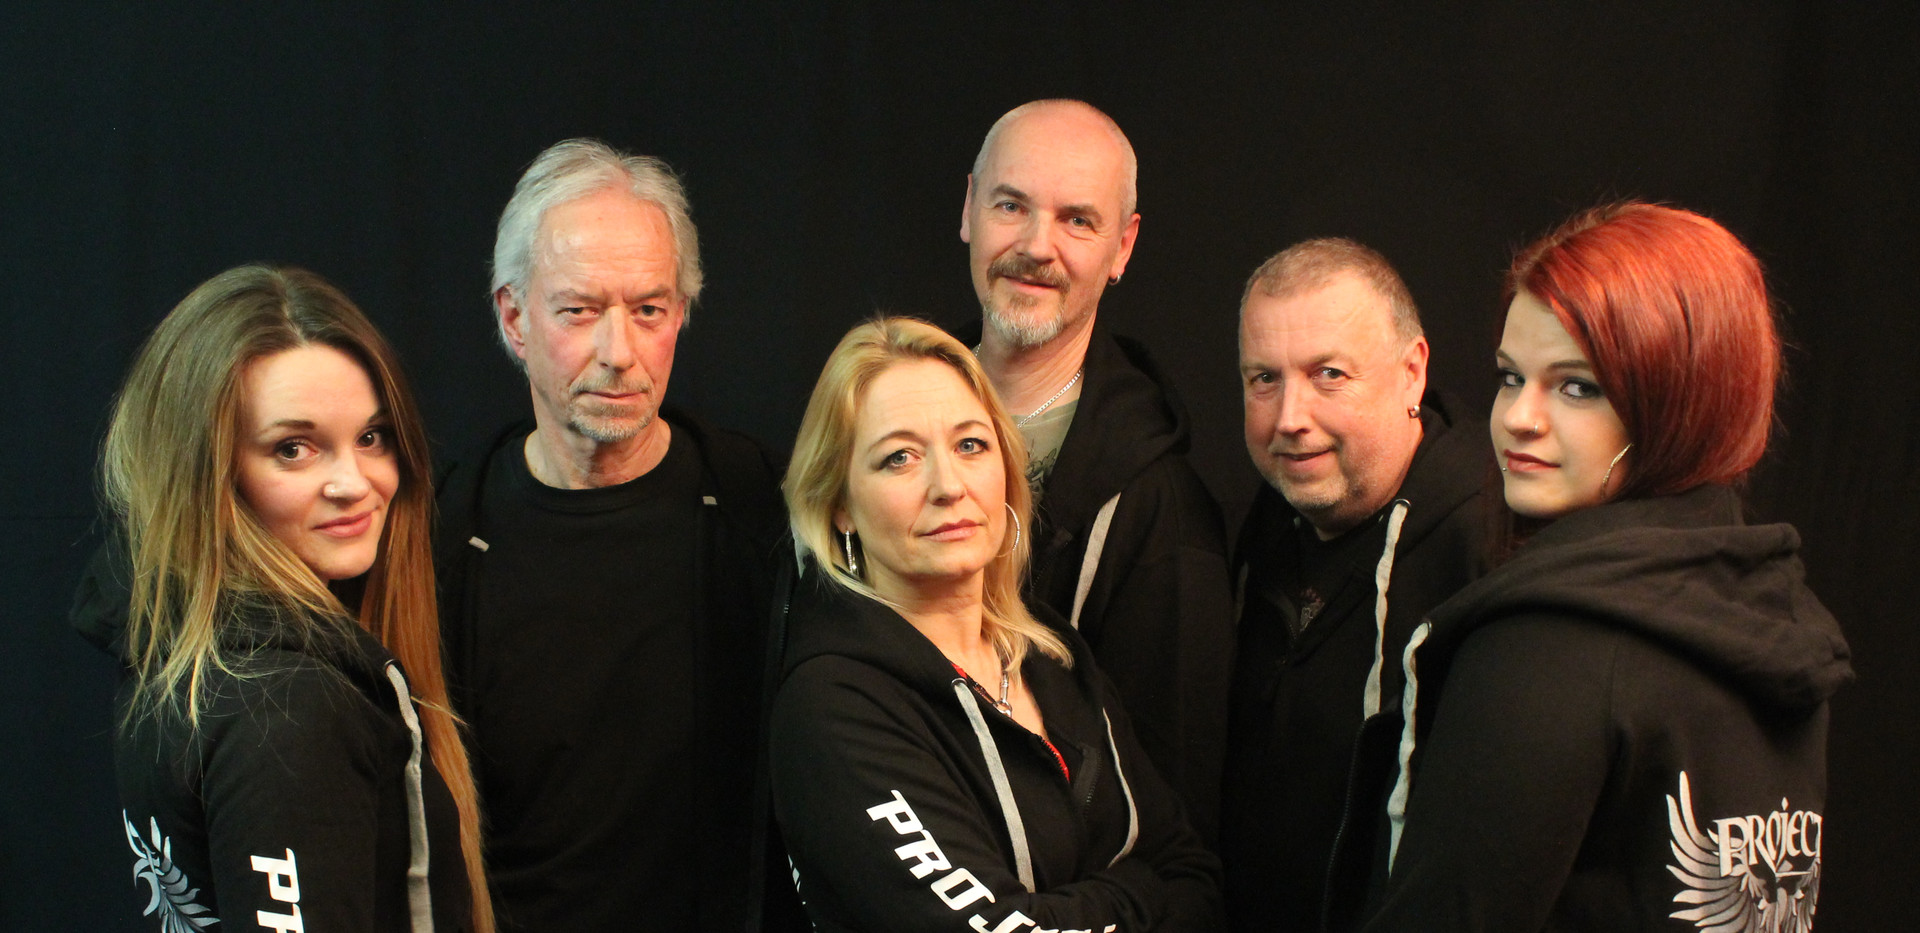 Band img02.JPG